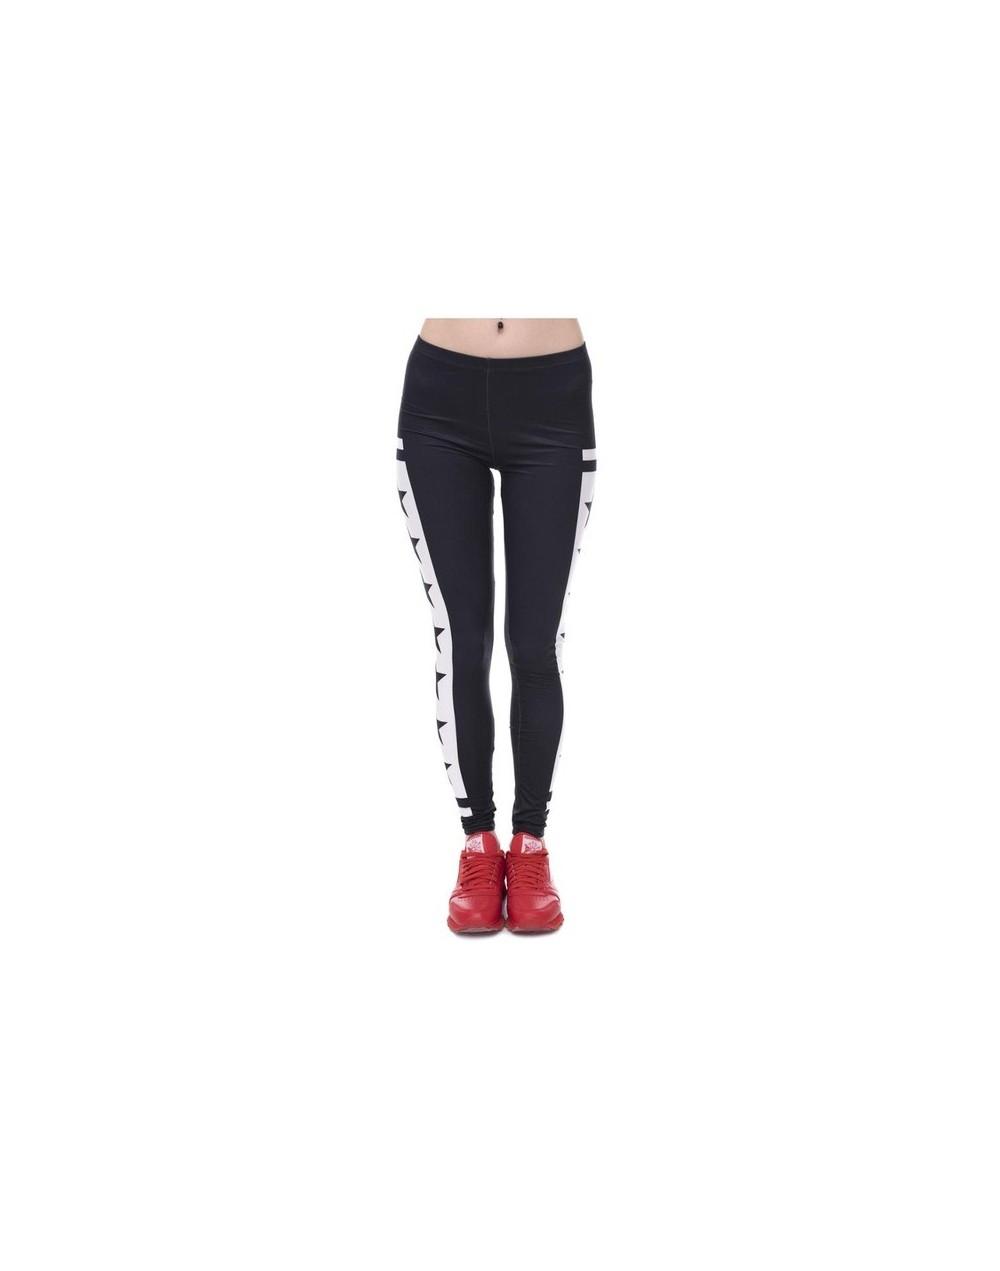 Womens Fashion Elasticity Yes and No Printed Slim Fit Legging Workout Trousers Casual Pants Leggings - lga40544 - 4U38237806...